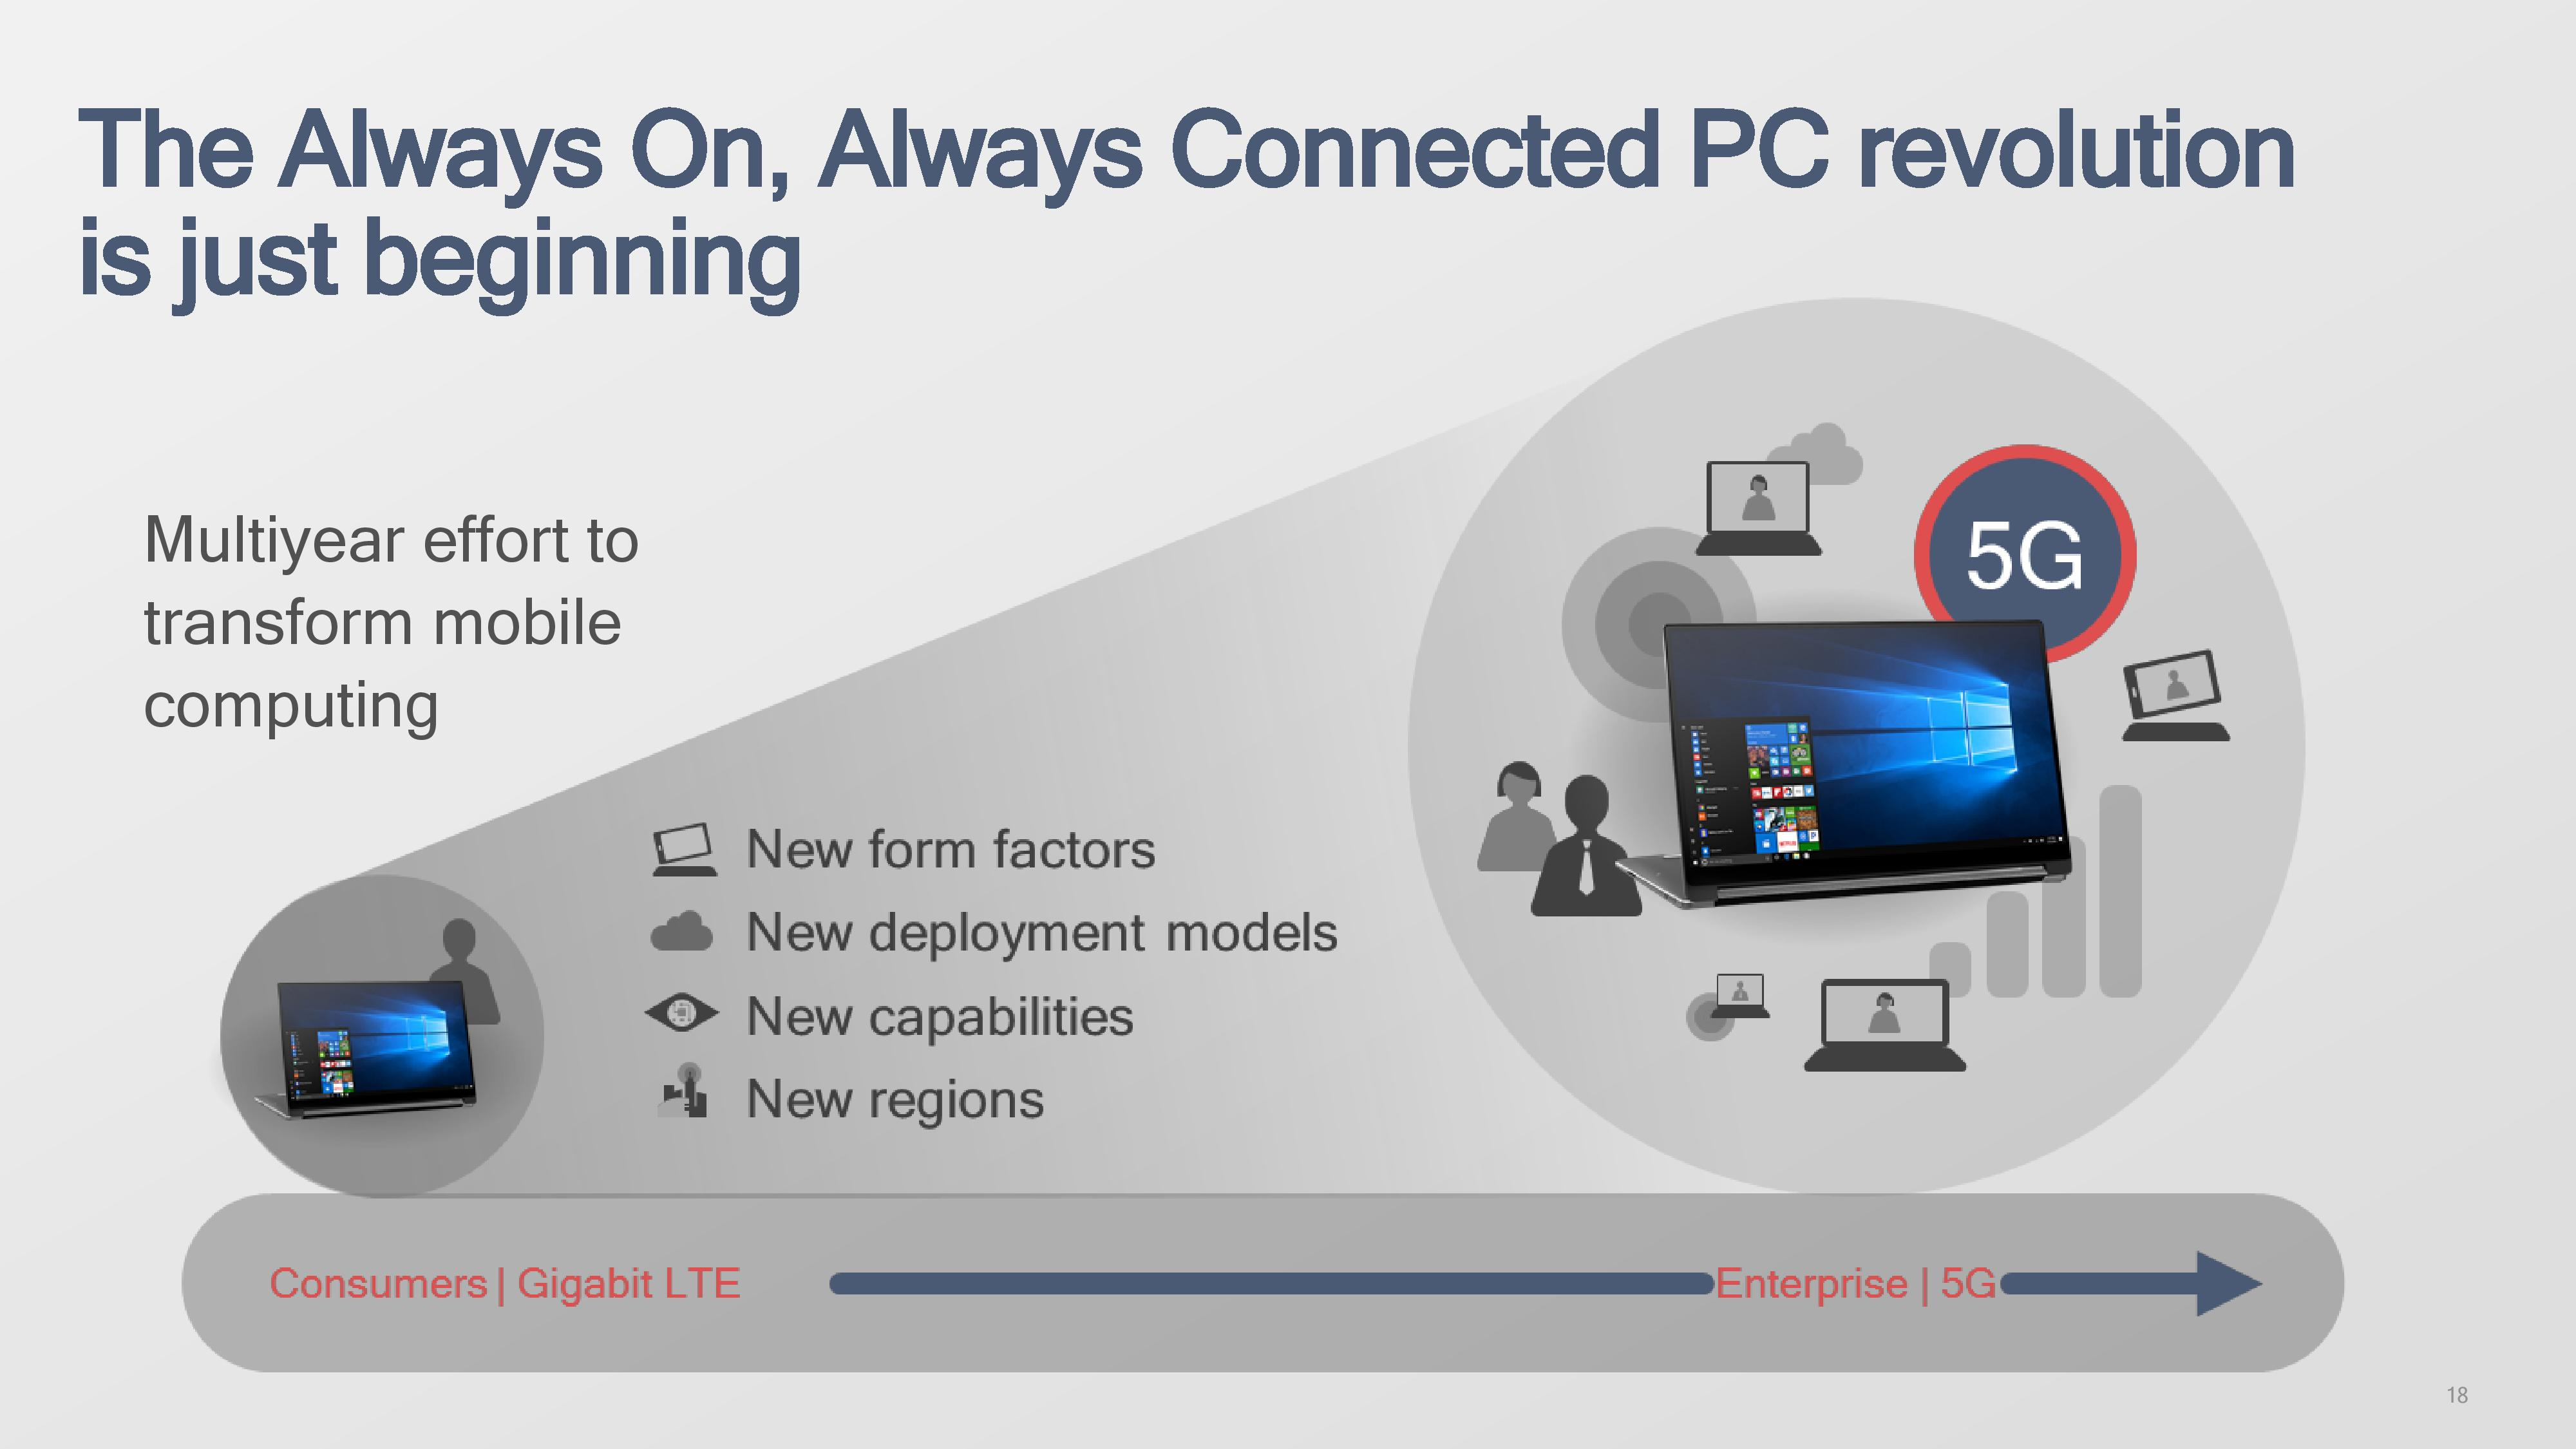 Qualcomm announces Snapdragon 850 Mobile processor for Always Connected Windows 10 PCs 4